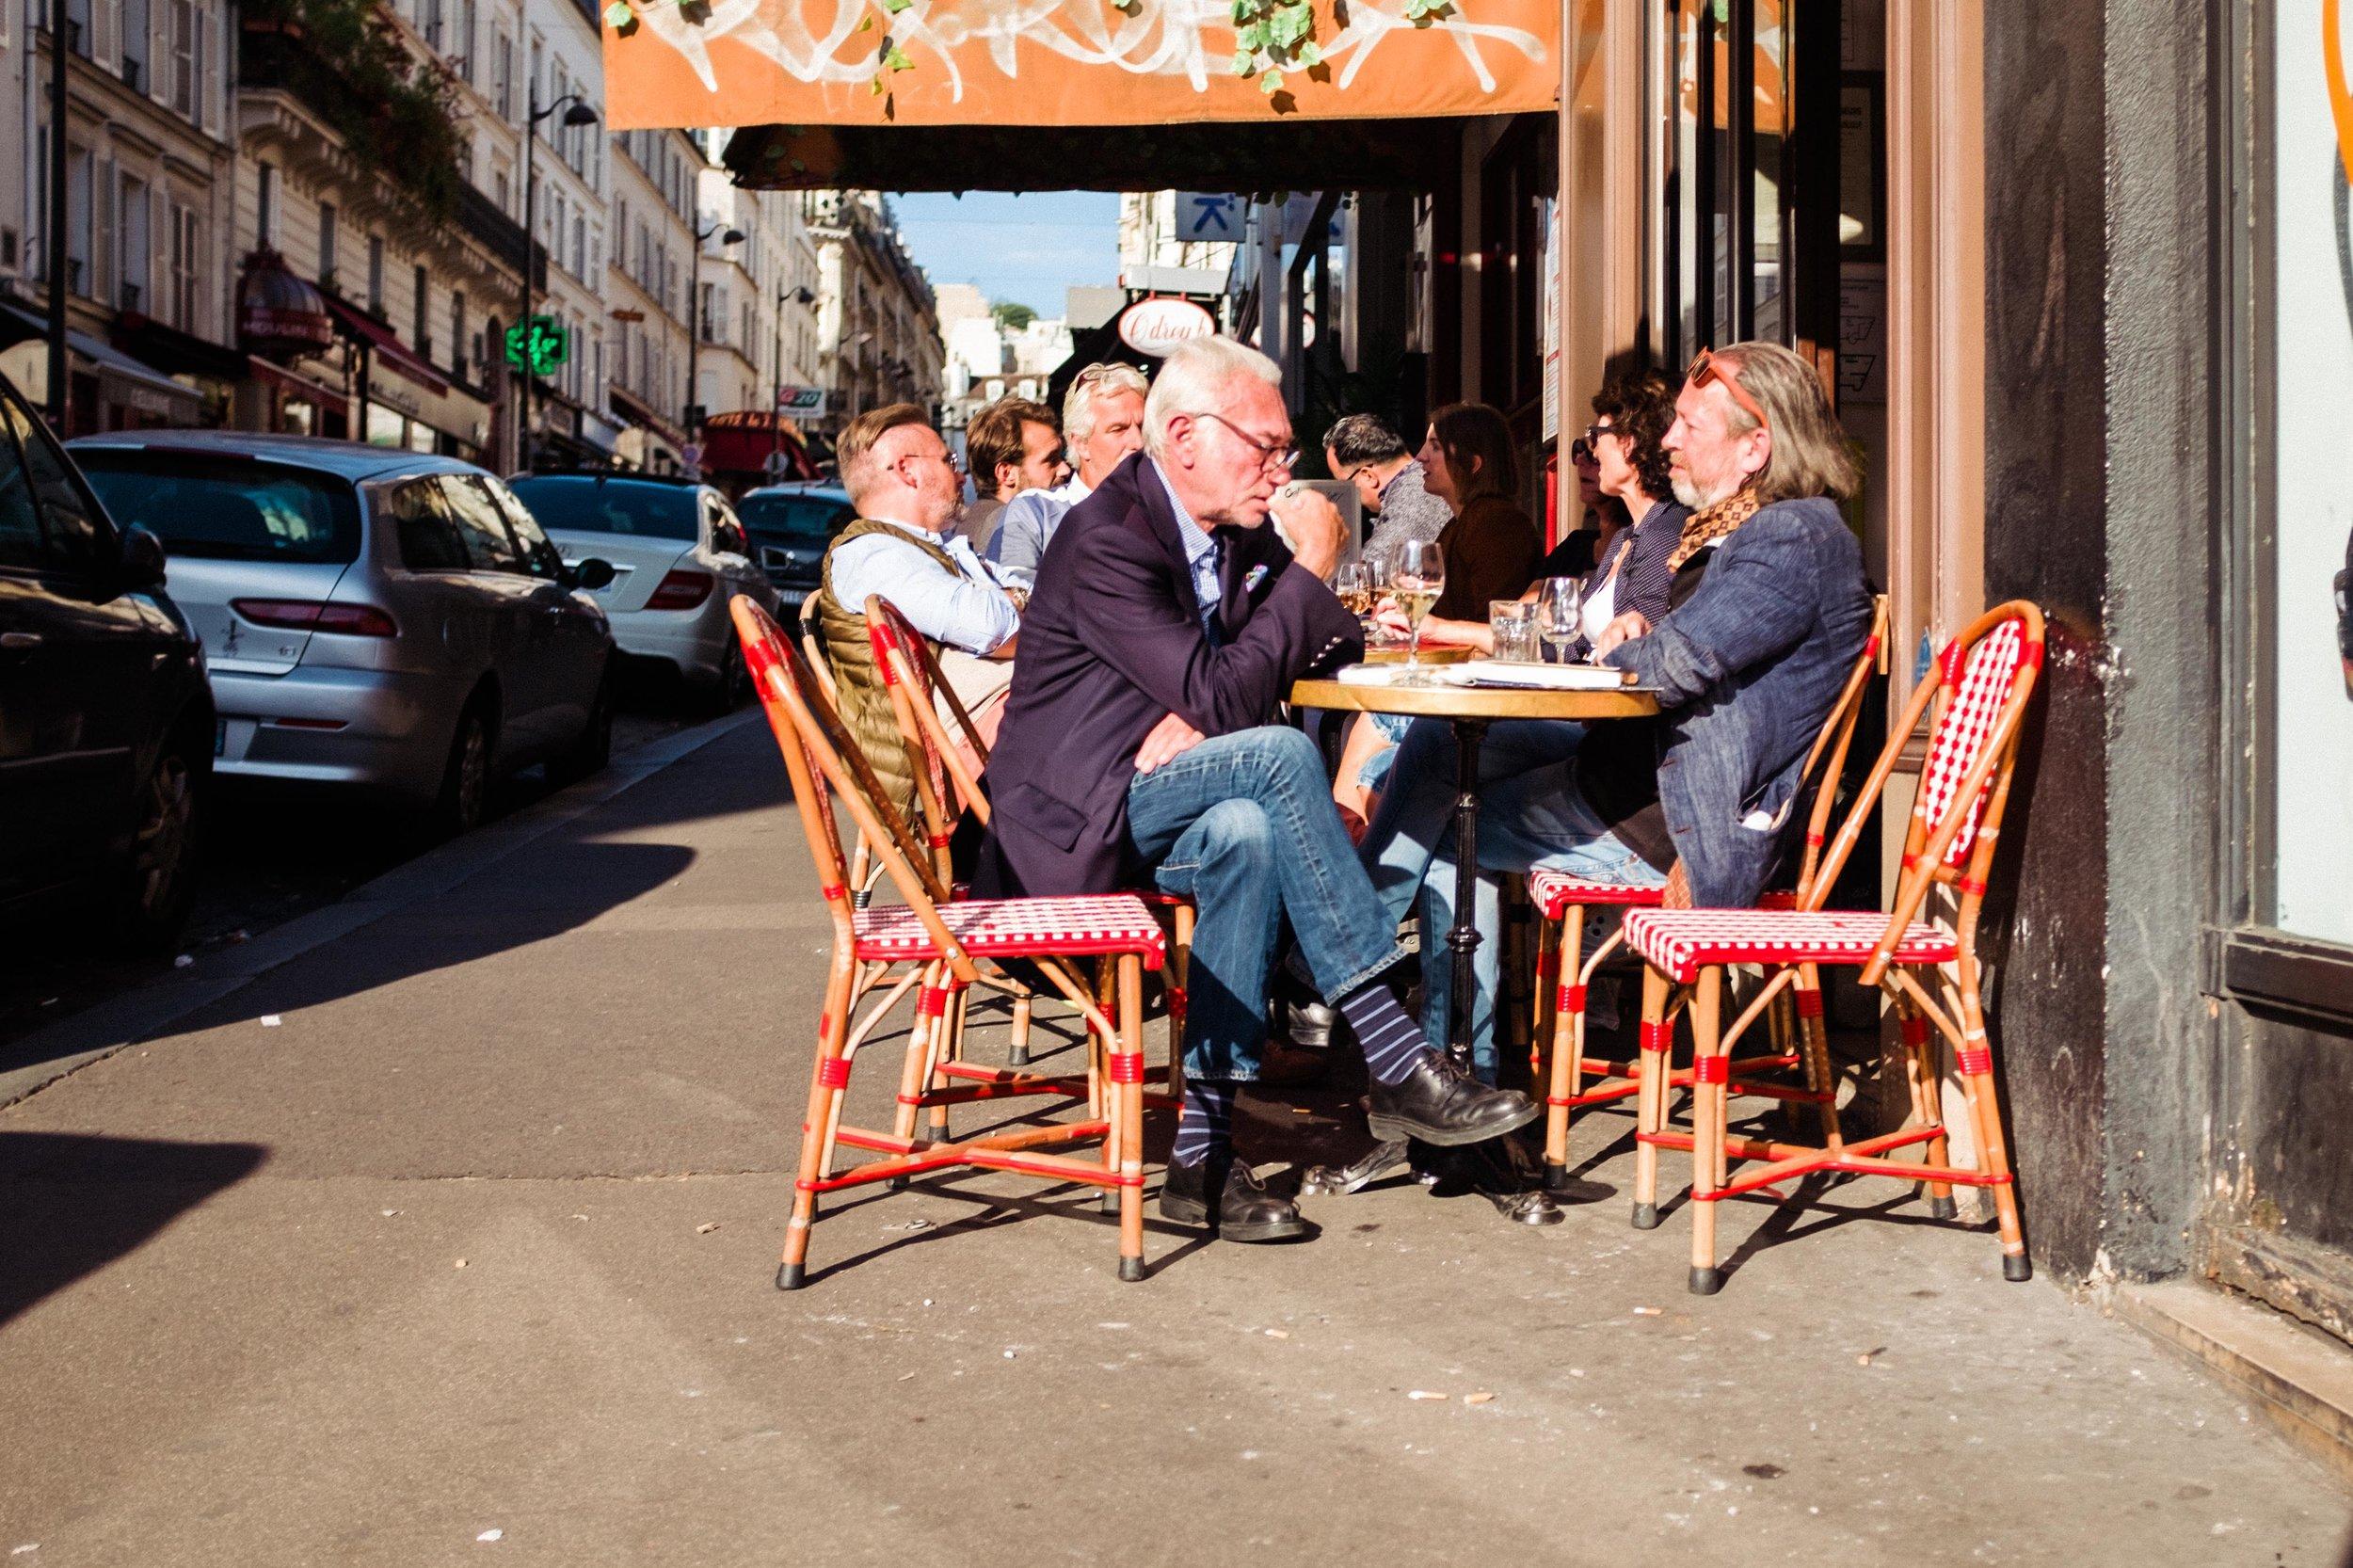 paris-france-sidewalk-cafe-montmartre